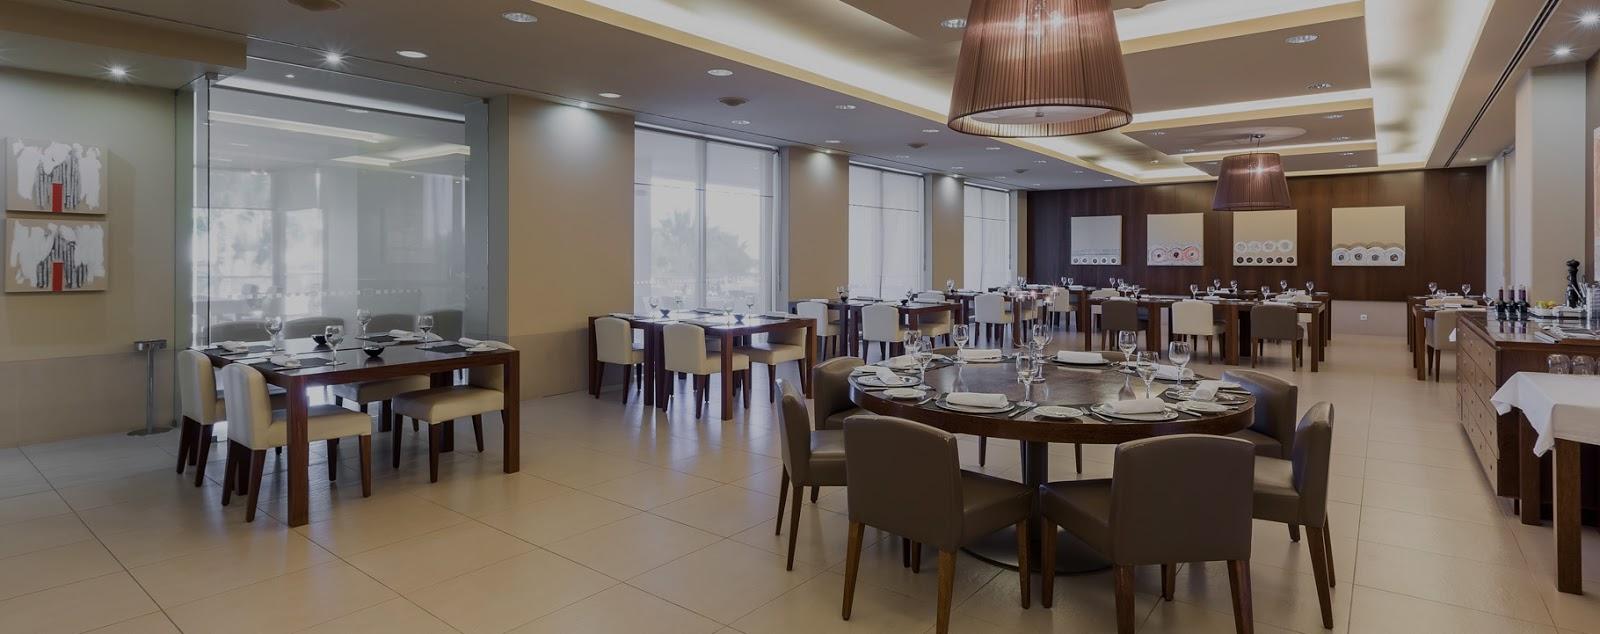 Nau São Rafael Suites Restaurants And Bars All Inclusive Hotel Algarve